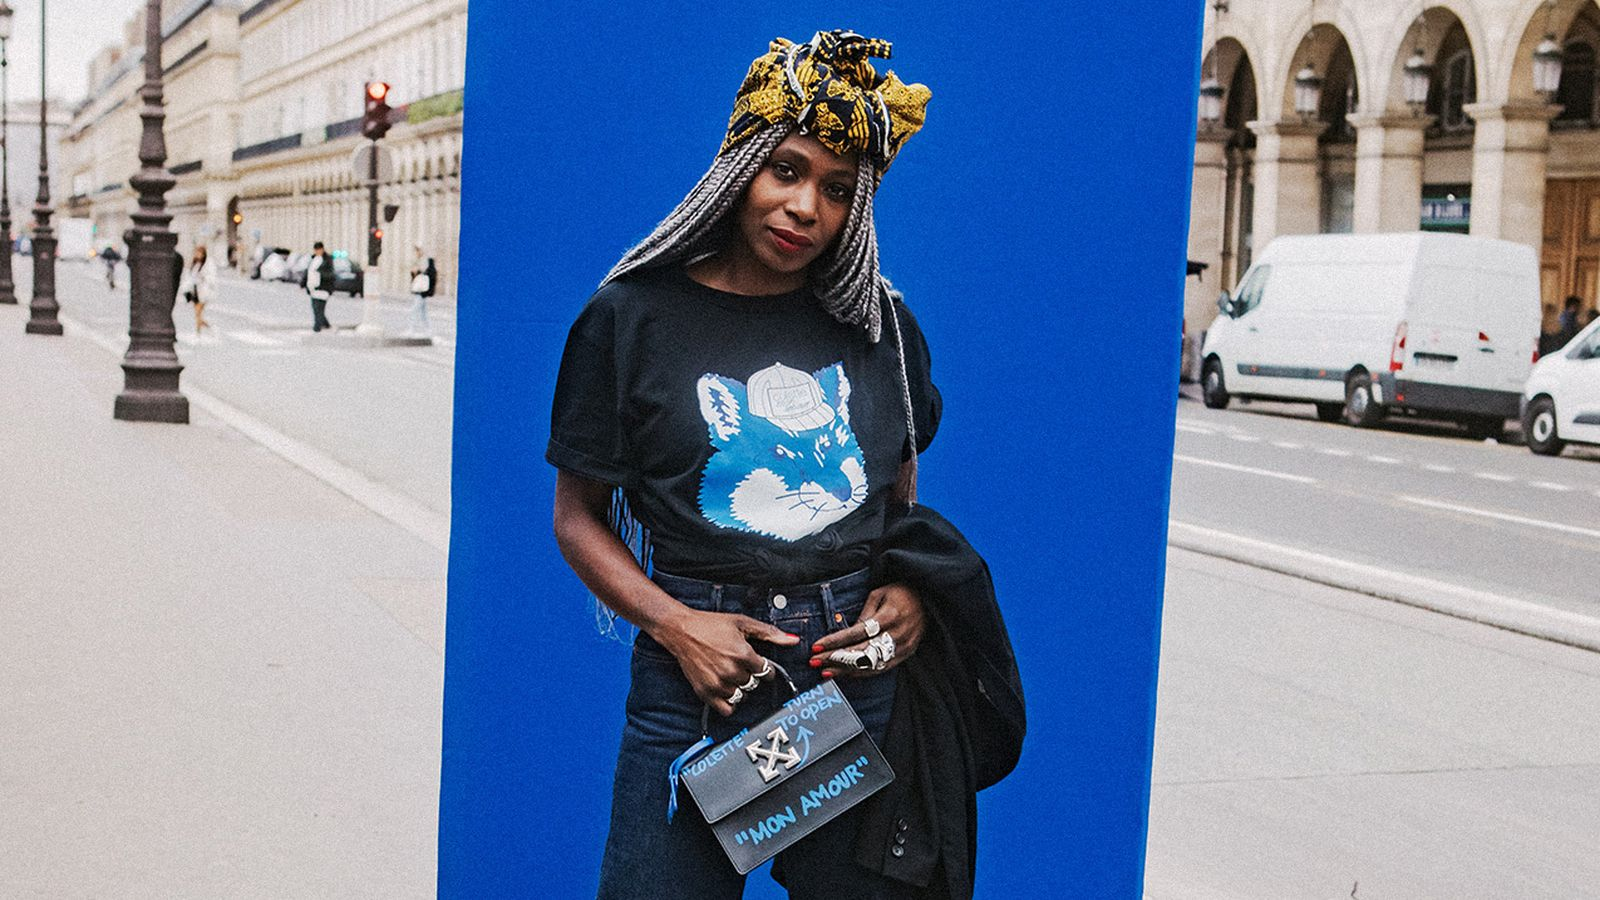 COLETTE MON AMOUR BY HIGHSNOBIETY - PARIS EDITION - campaign